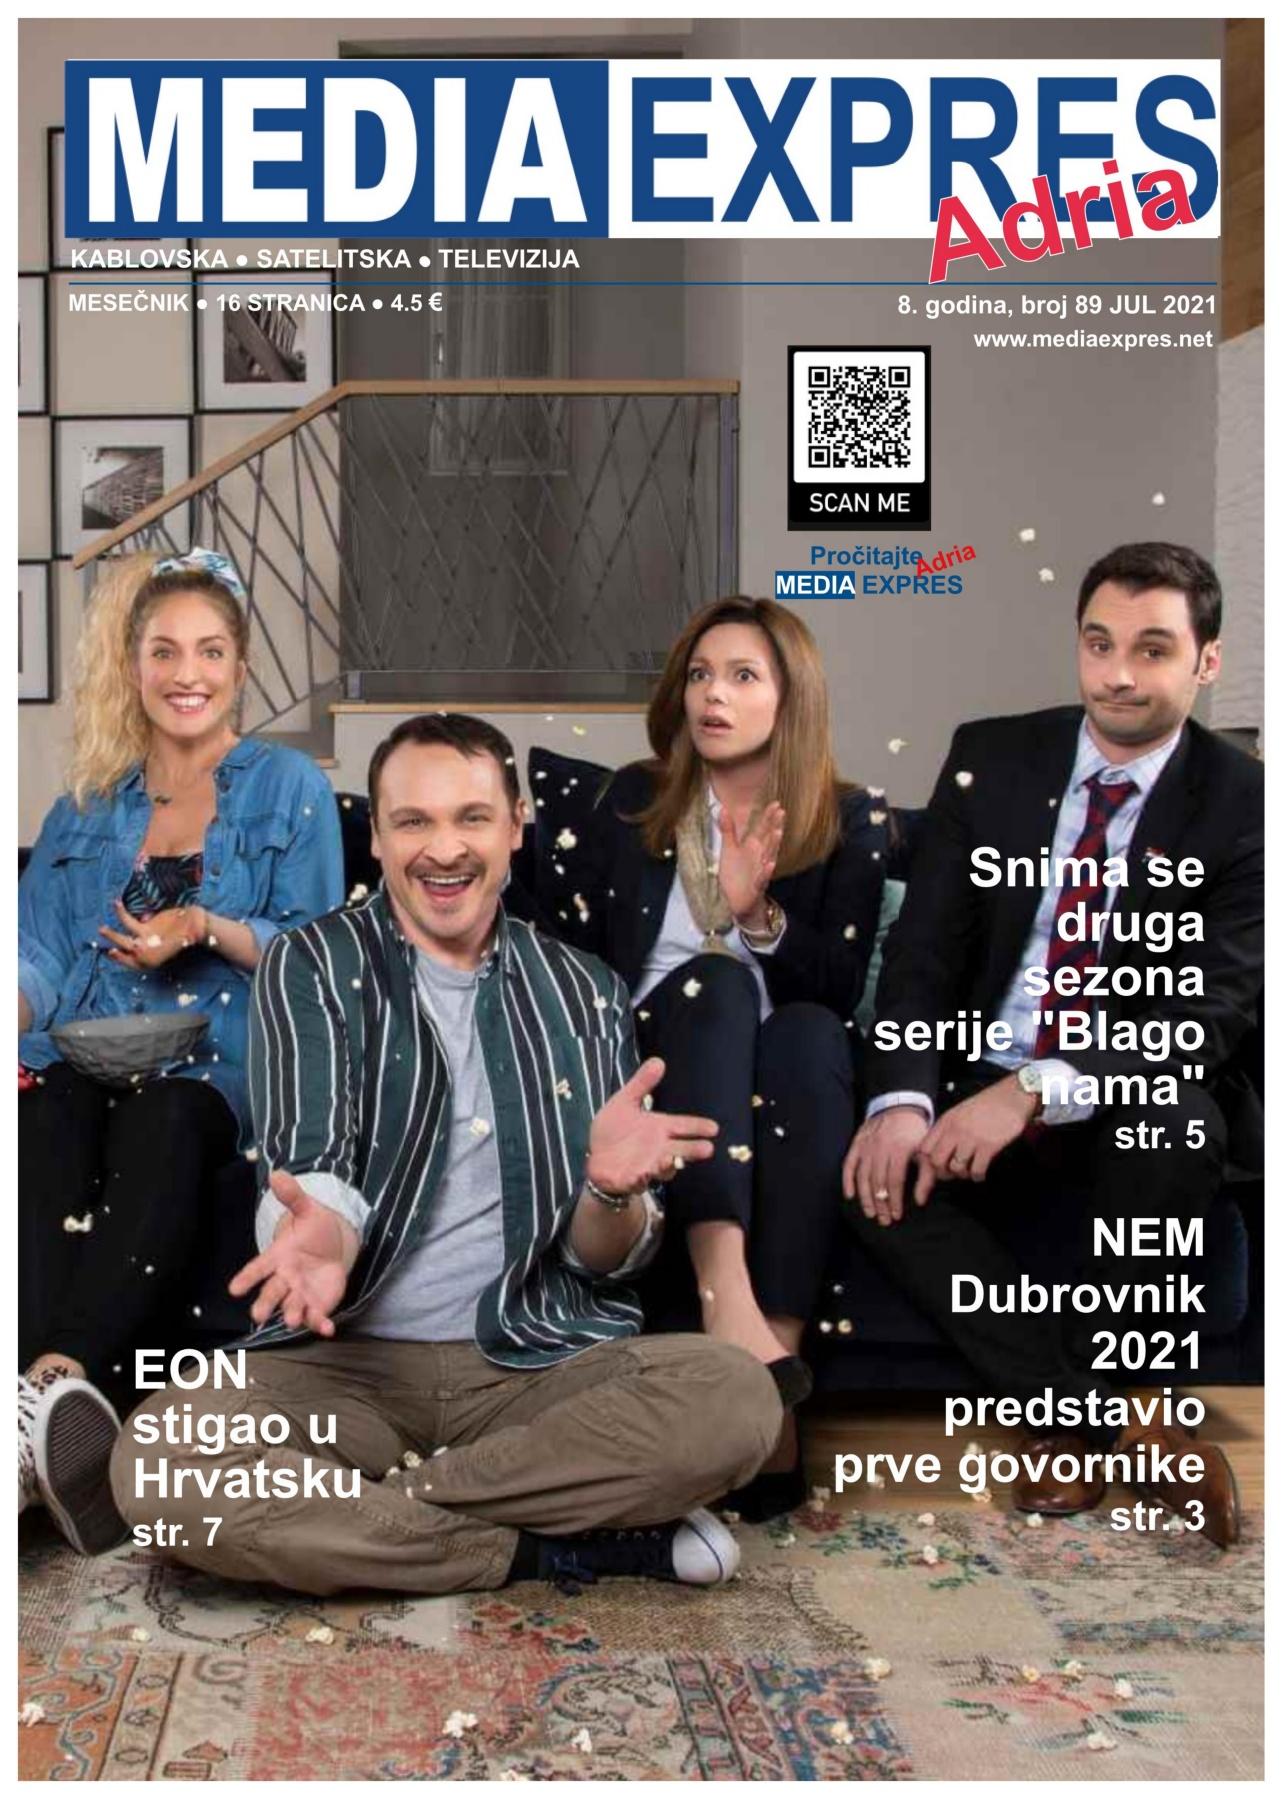 Media Expres Adria No 7 JUL 2021 1st Cover